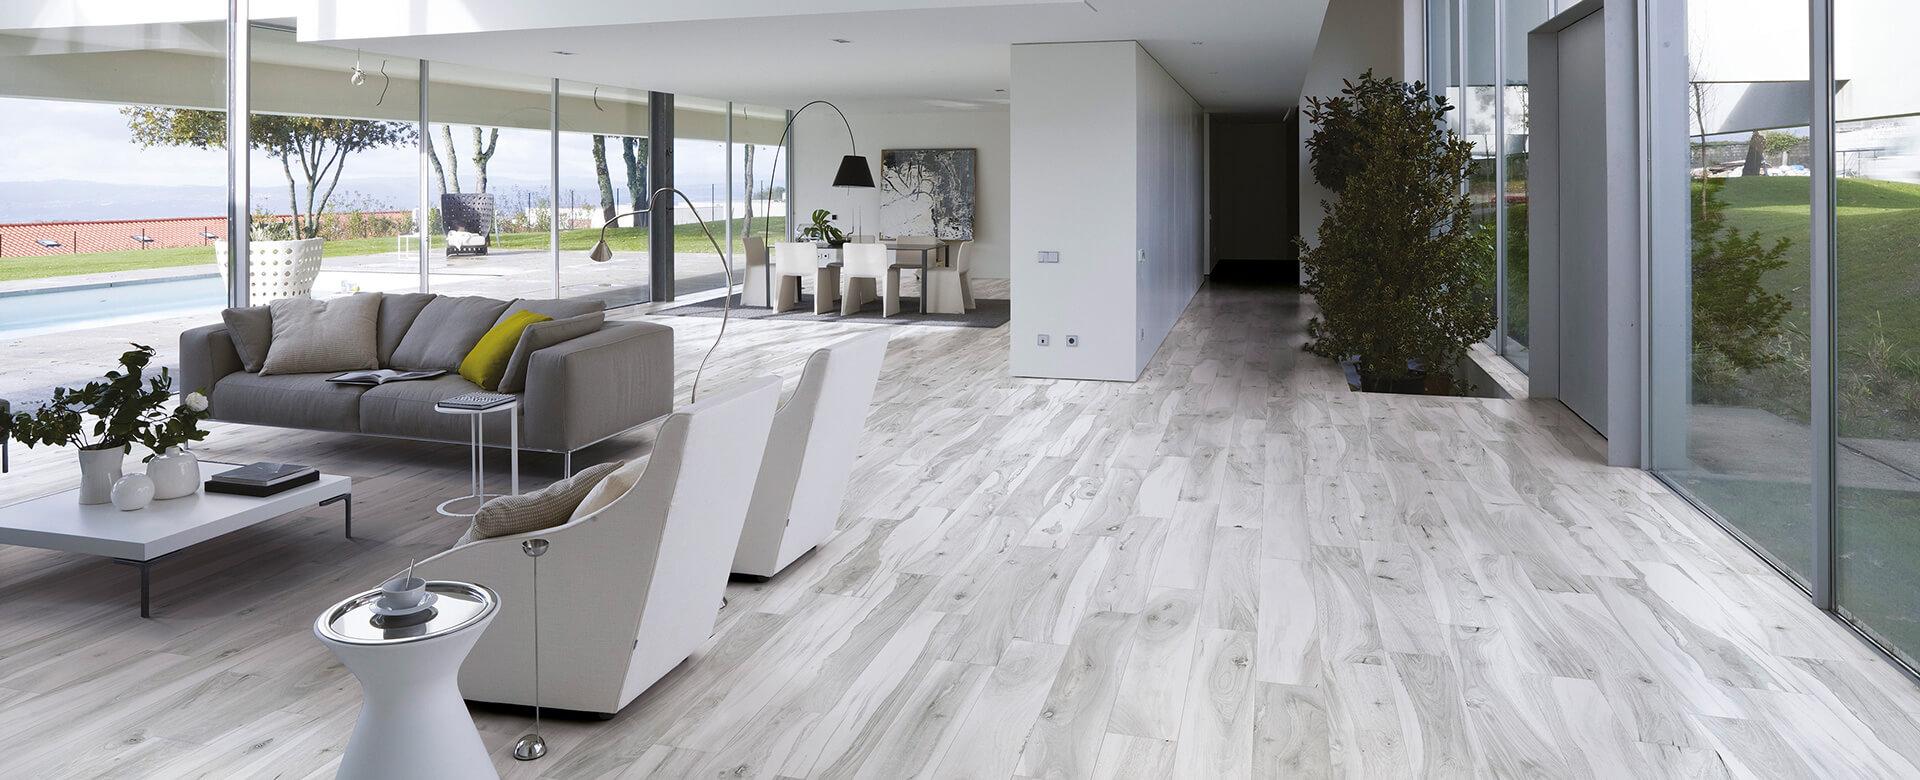 Home byrd tile elegance dailygadgetfo Images